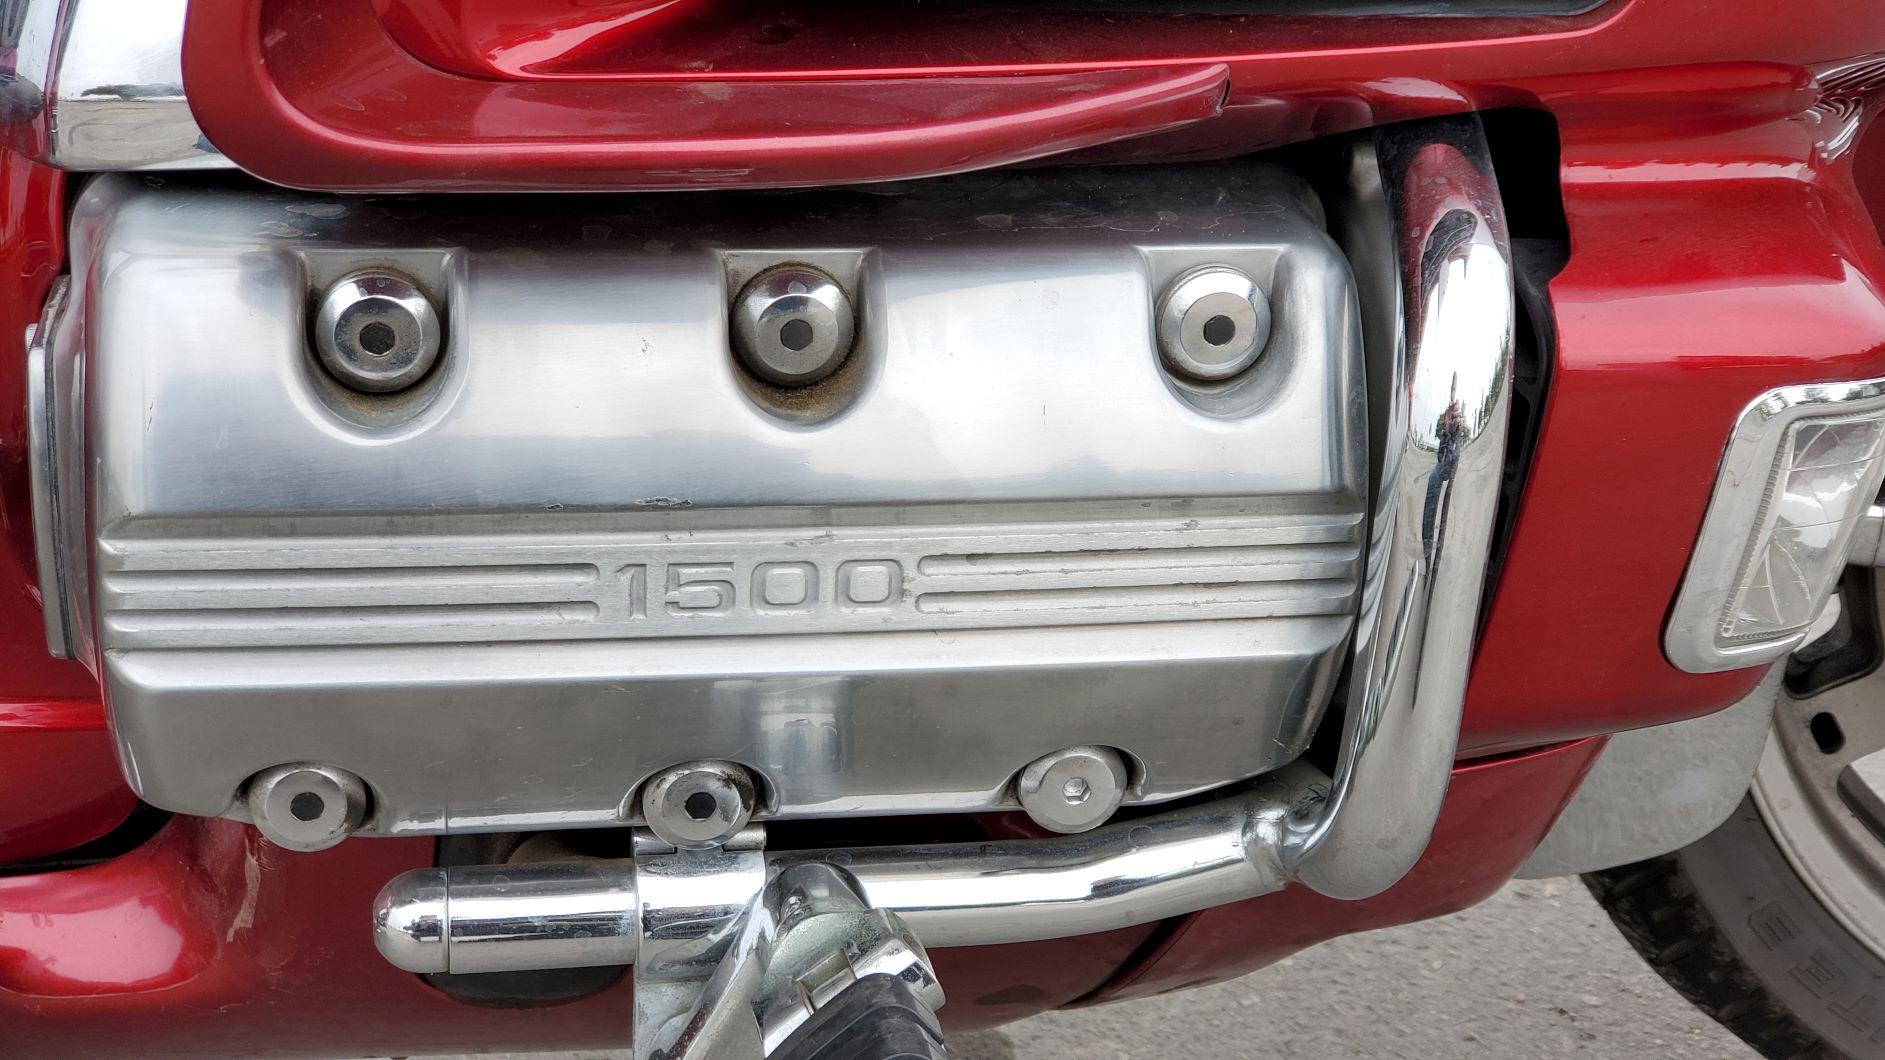 Honda Goldwing 1500 se, albesadv, honda motorcycle, albe's adv, goldwing